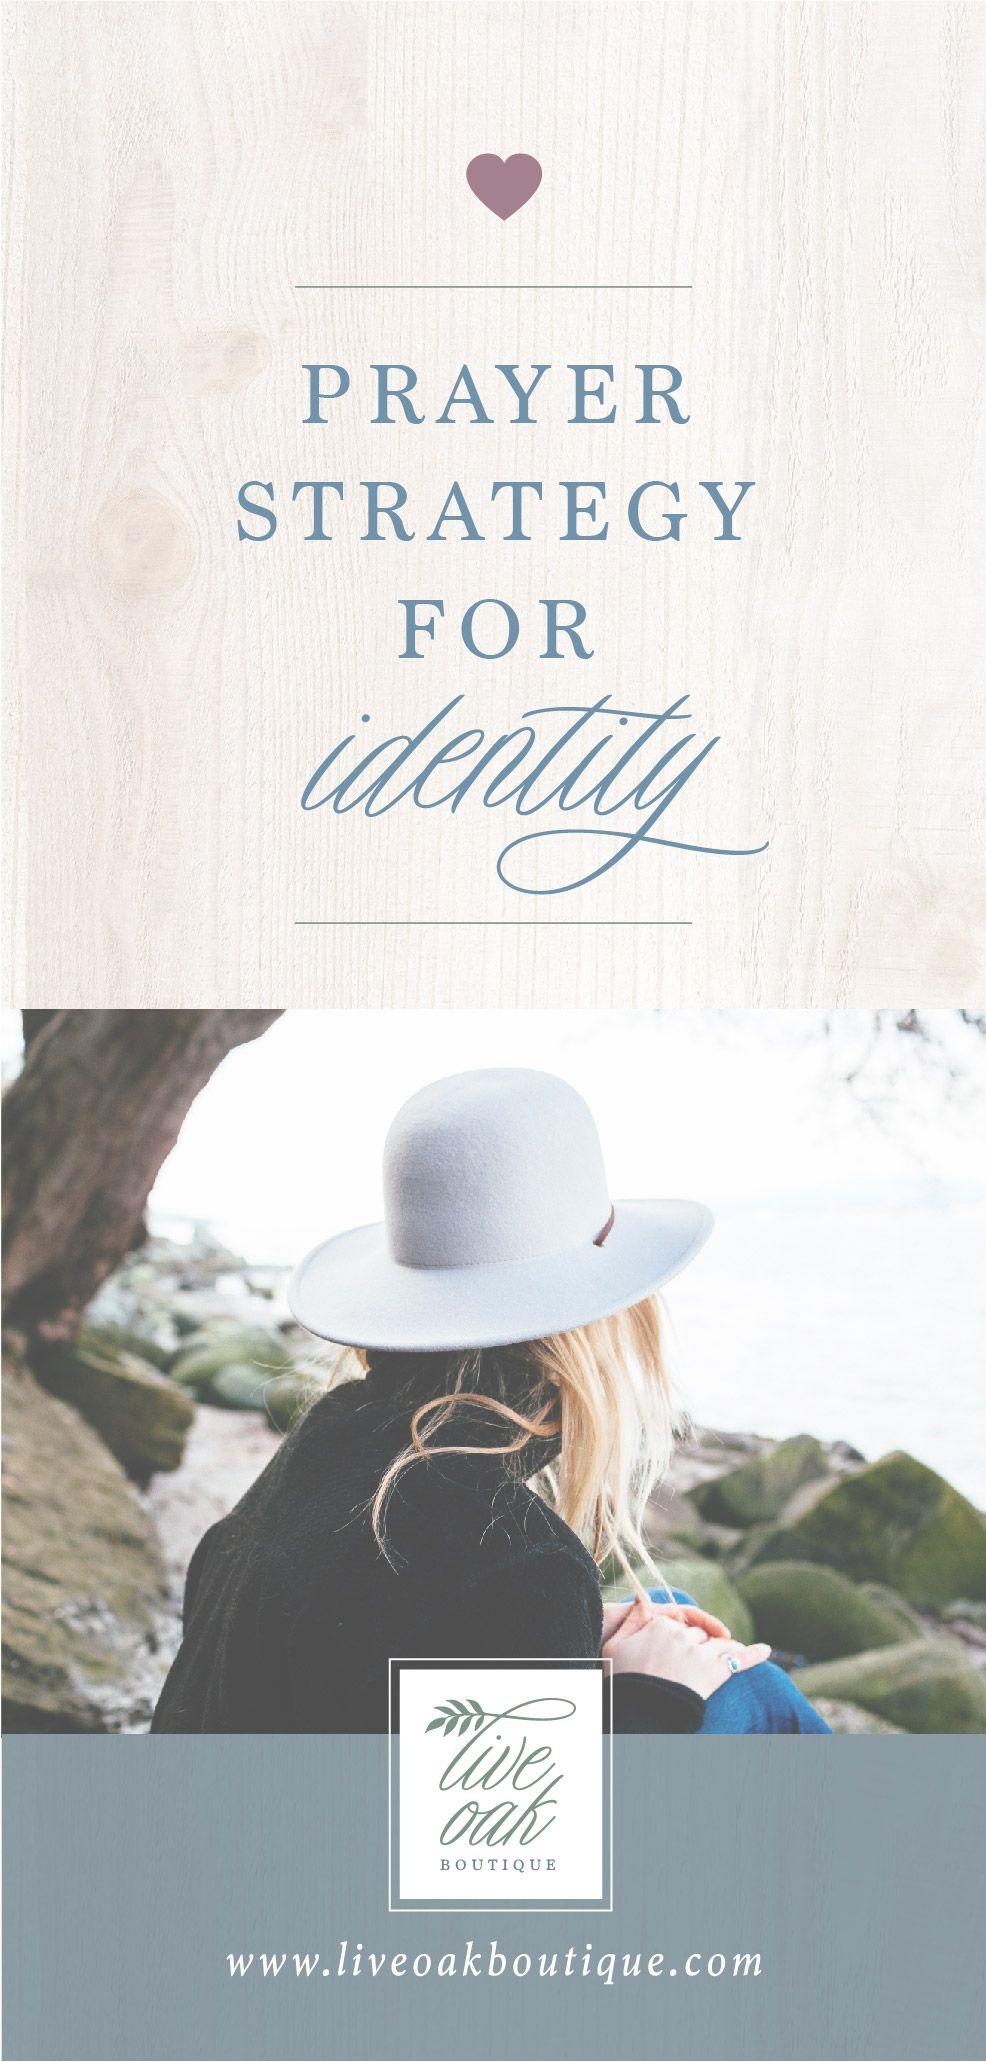 Fervent: Prayer Strategy for Identity | Bible Christian Info